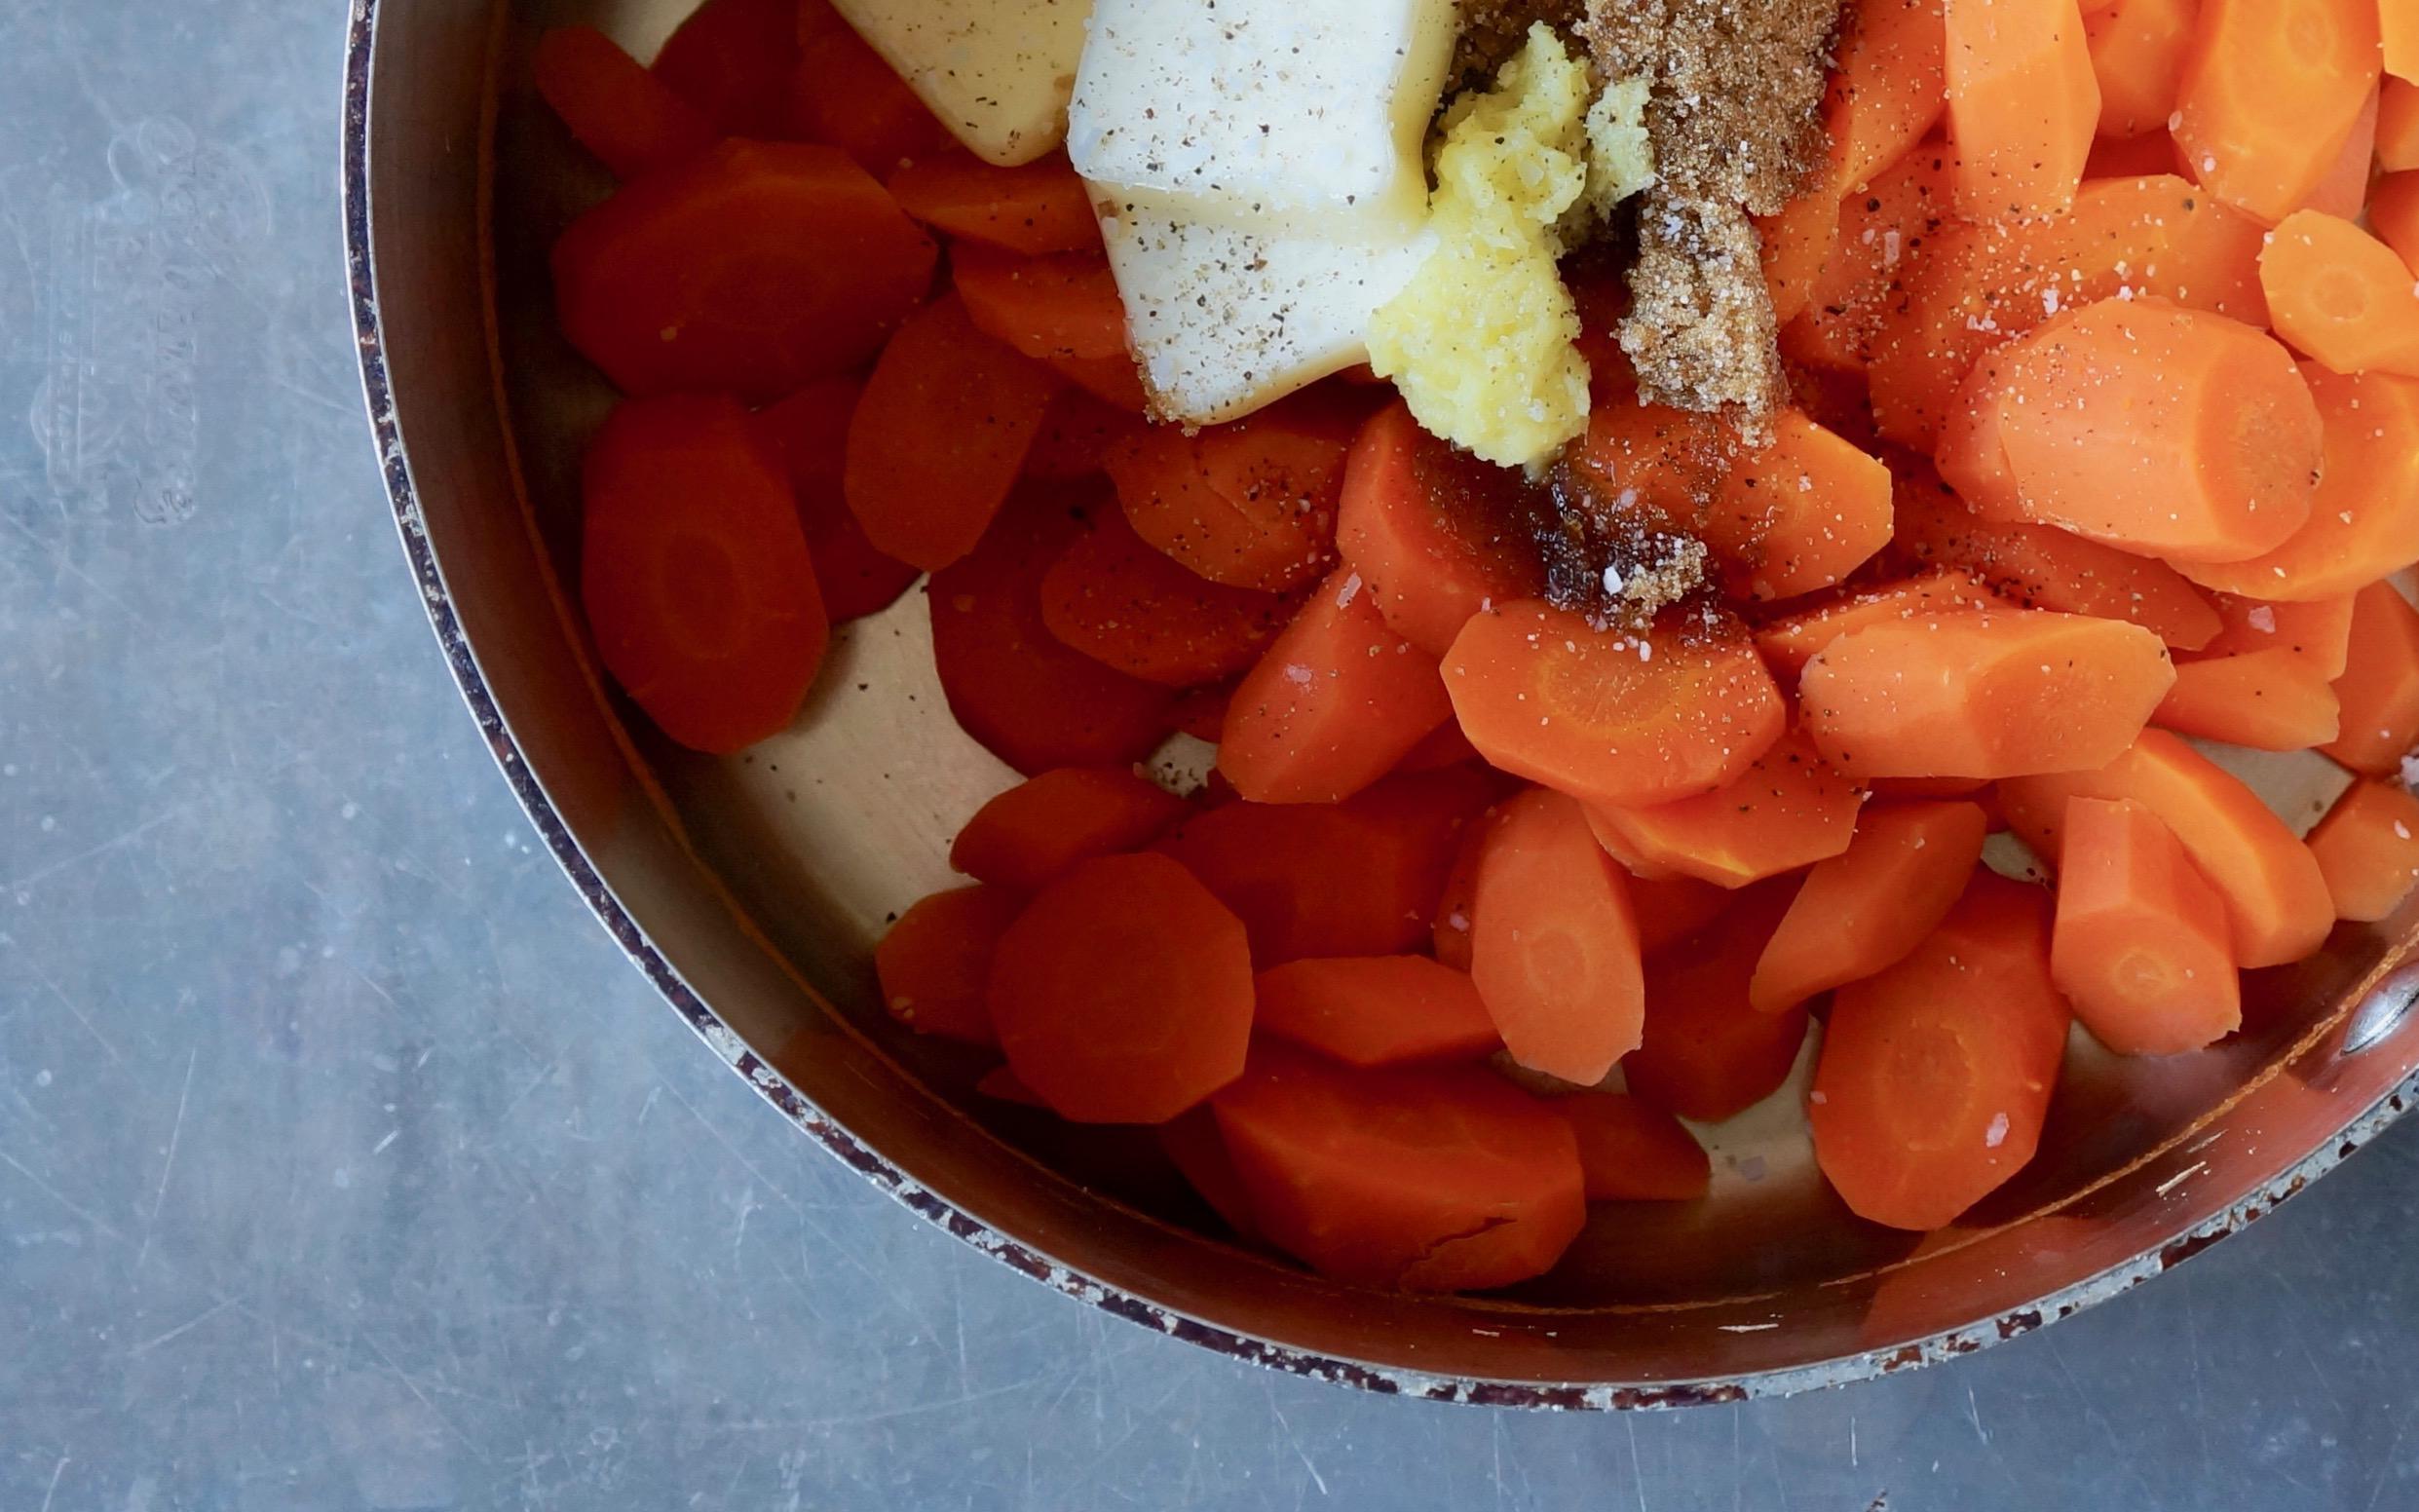 How-To-Make-Ginger-Lemon-Glazed-Carrots-Rebecca-Gordon-Buttermilk-Lipstick-Culinary-Entertaining-Technique-Southern-Hostess-RebeccaGordon-Pastry-Chef-Birmingham-Alabama